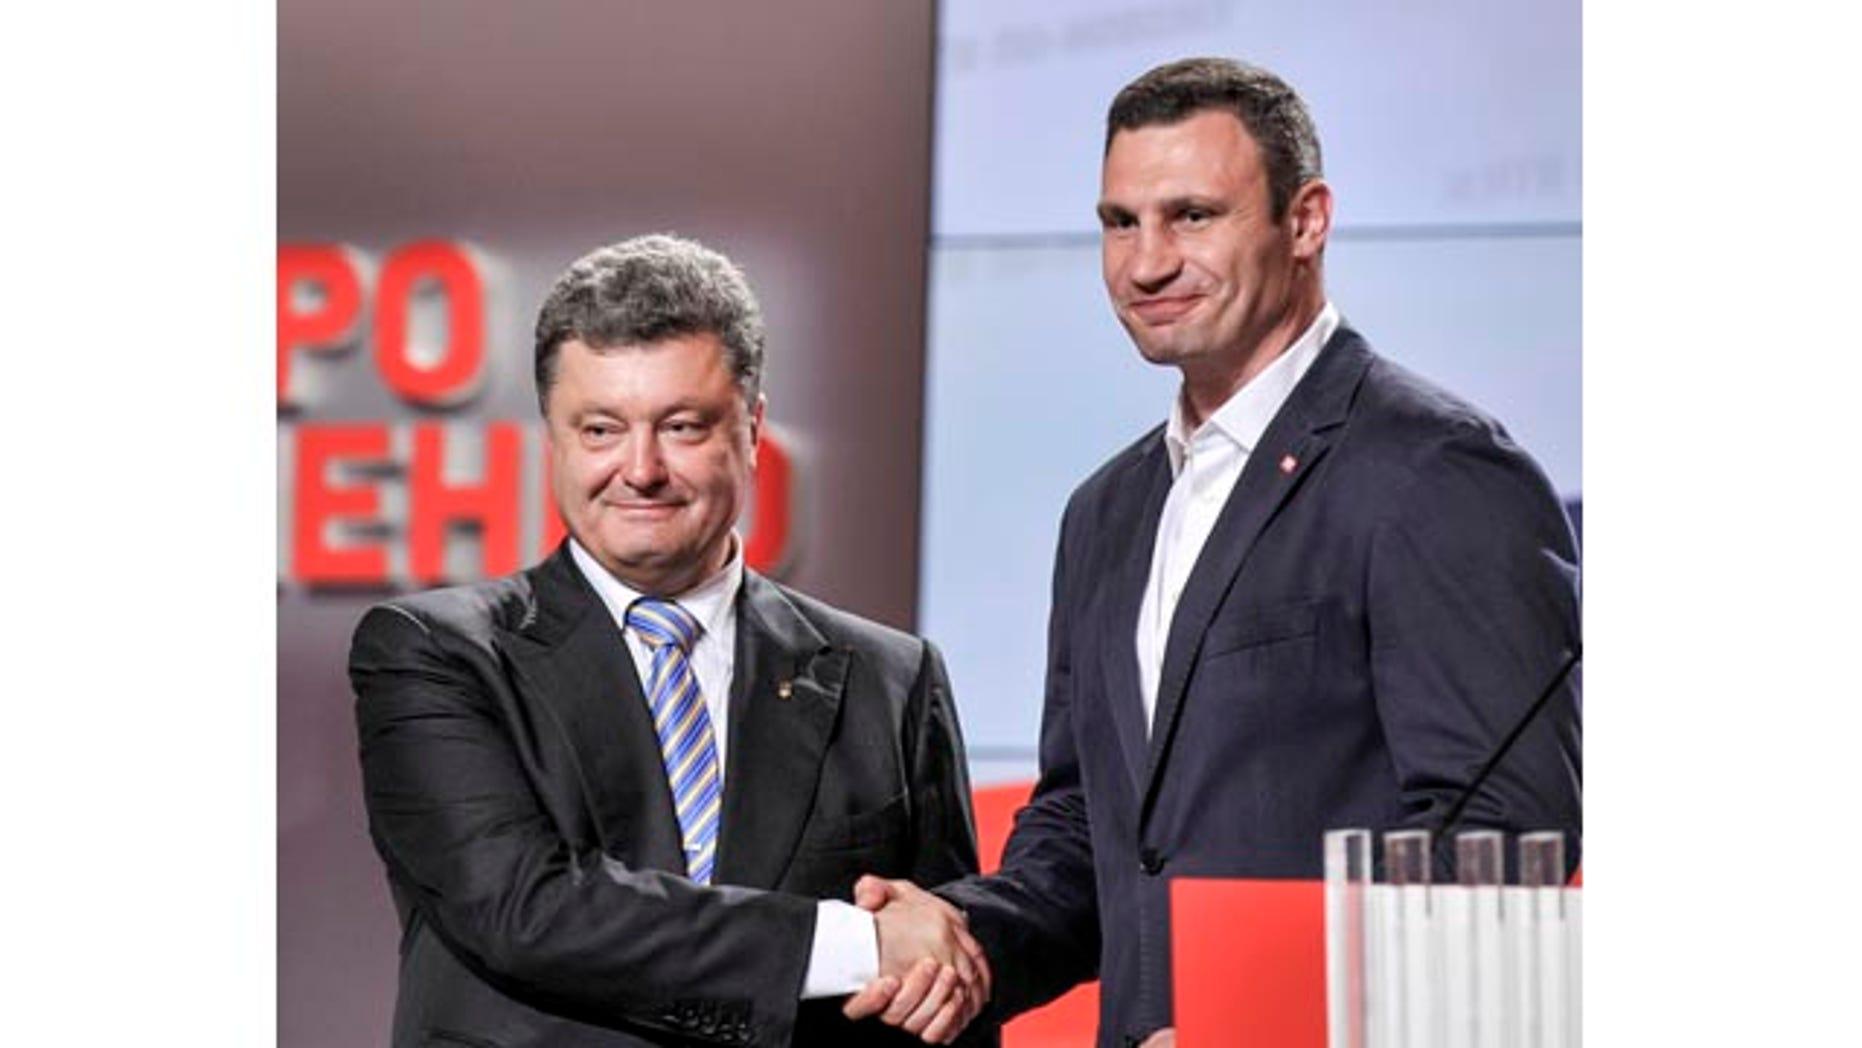 May 25, 2014: Ukrainian presidential candidate Petro Poroshenko, left, shake hands with Kiev mayoral candidate Vitali Klitschko during their press conference in Kiev. (AP Photo/Mykola Lazarenko, Pool)